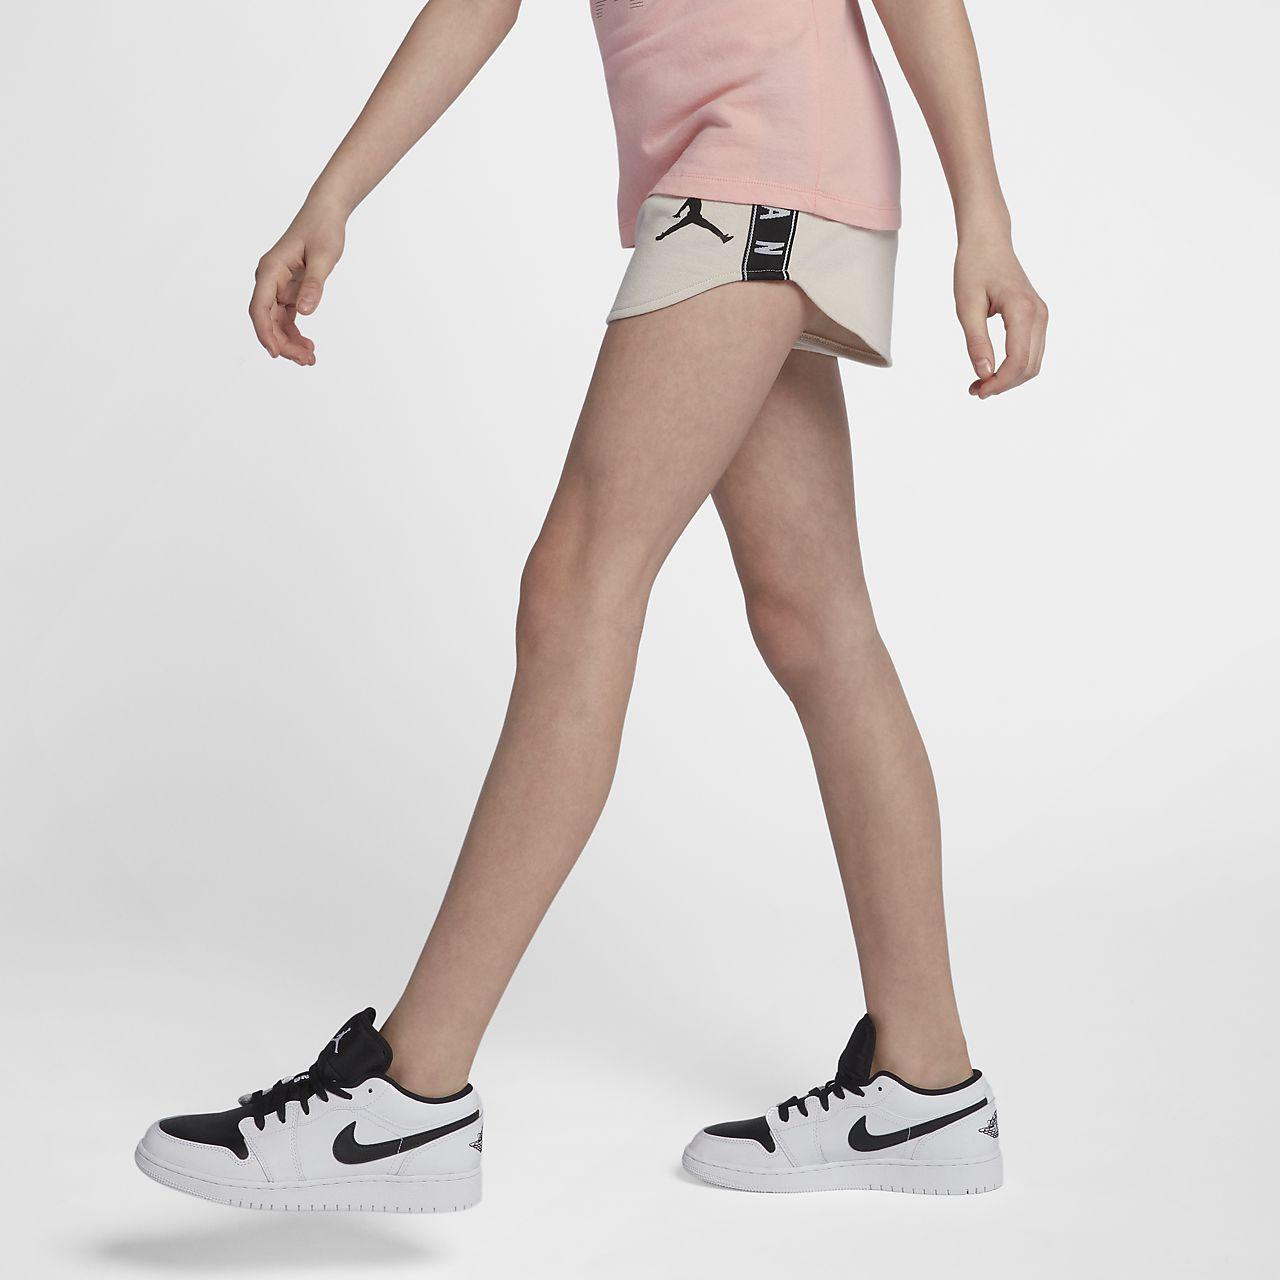 Jordan Elevated Jogger 大童(女孩)短裤